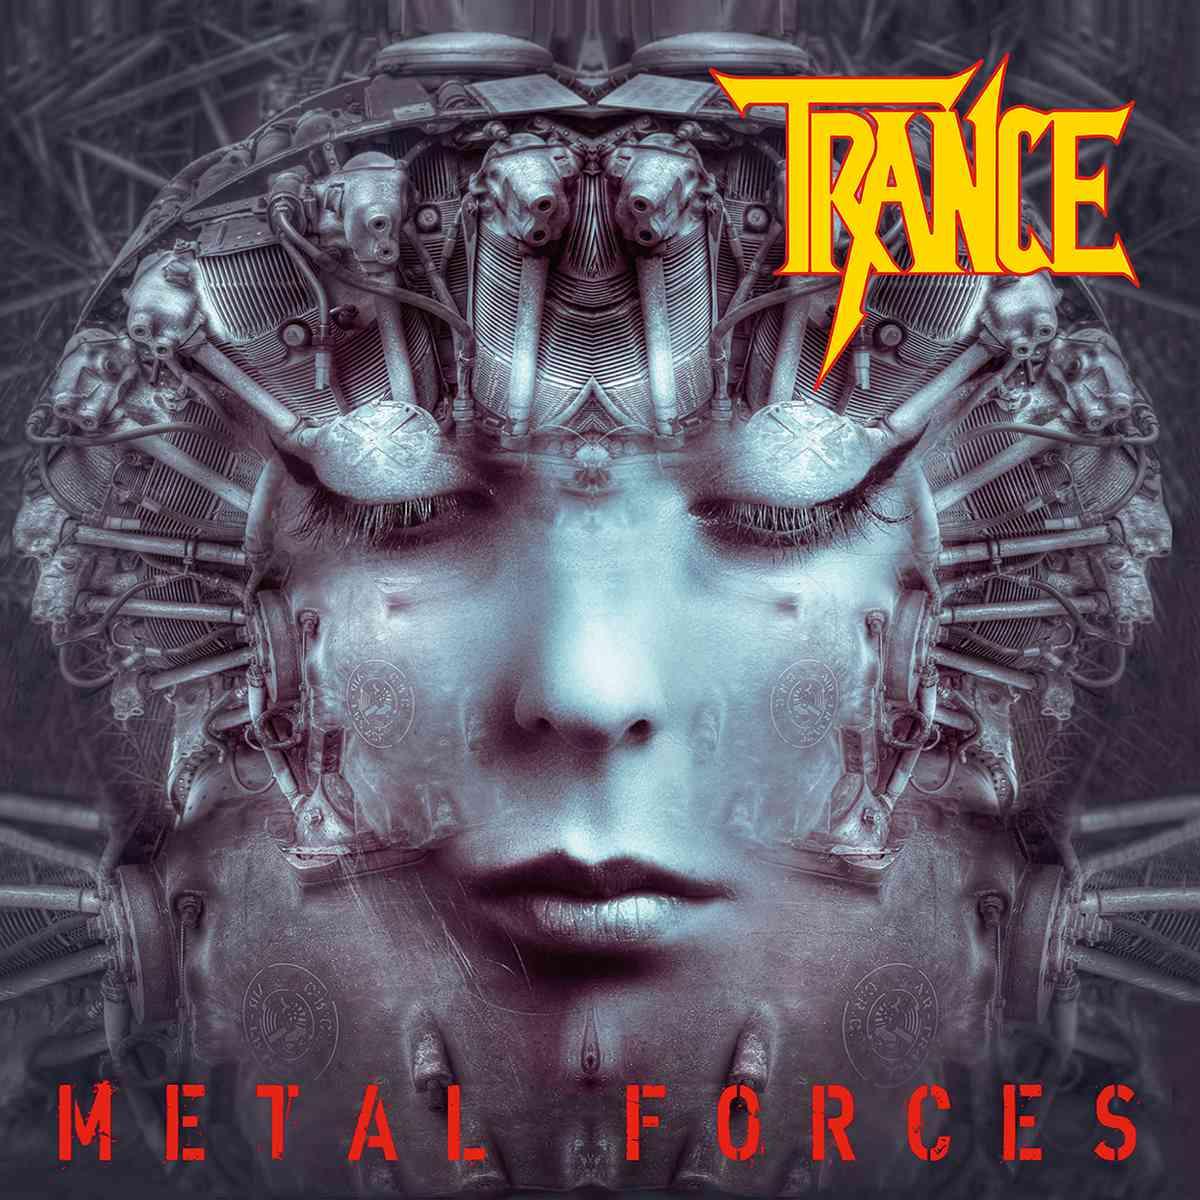 trance - metal forces - album cover